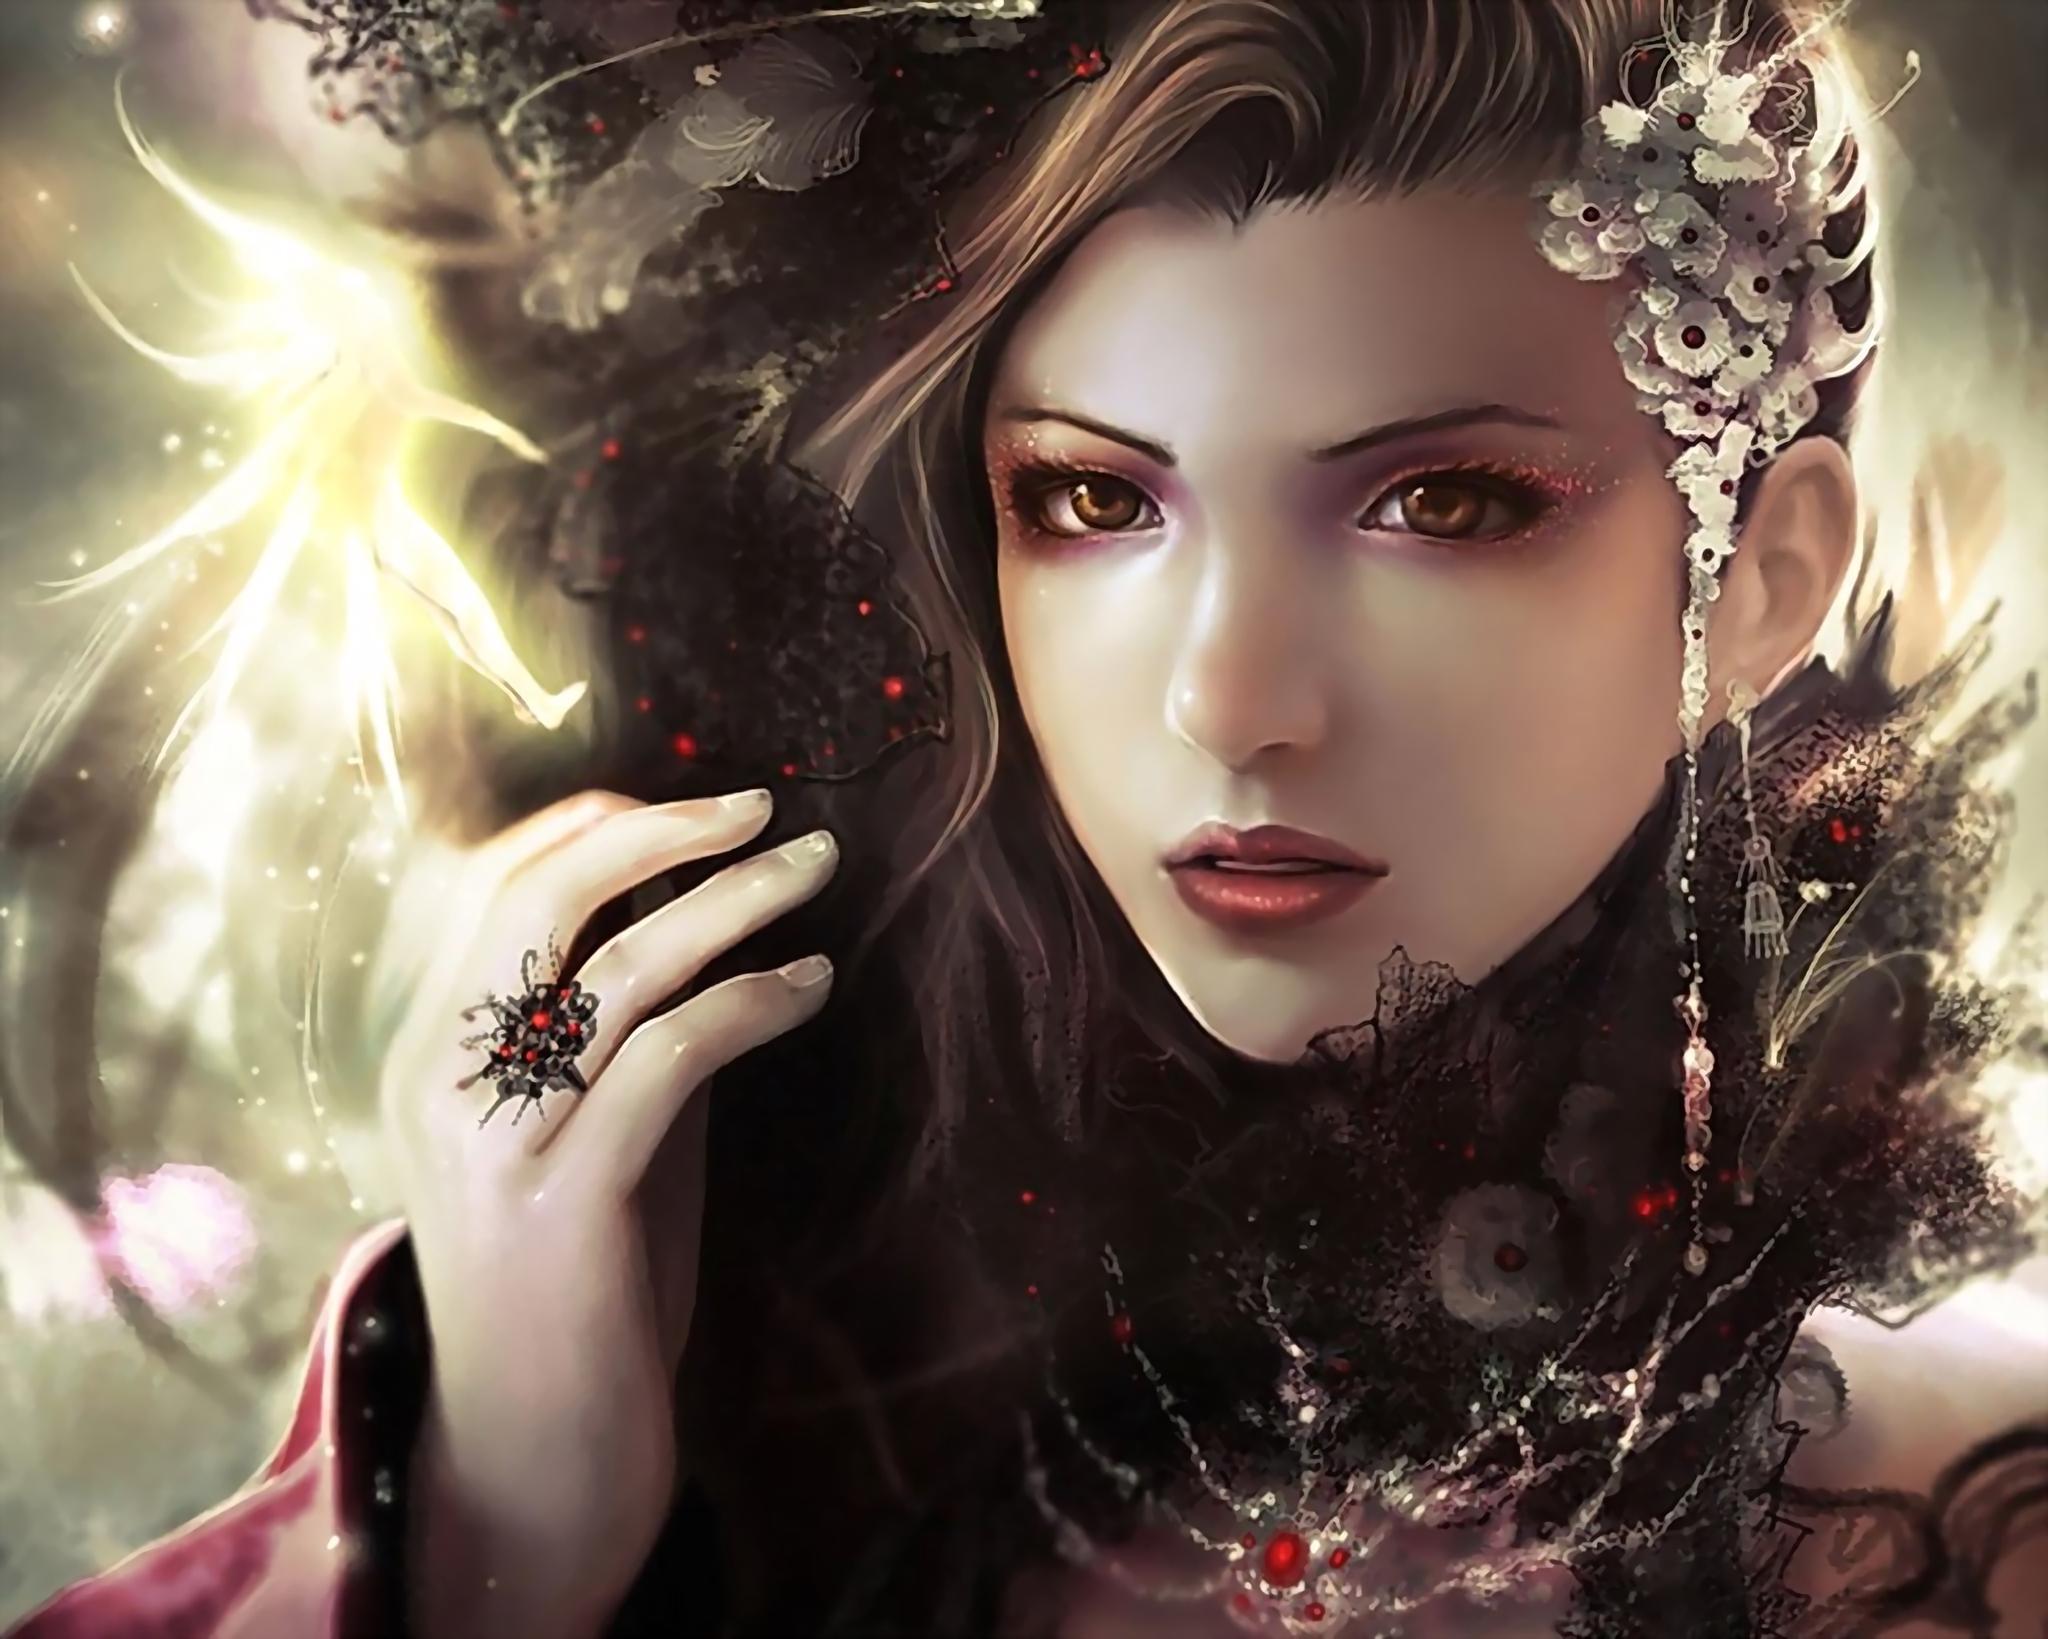 CGI - Vrouwen  Whisper Magie Superb! Wallpaper